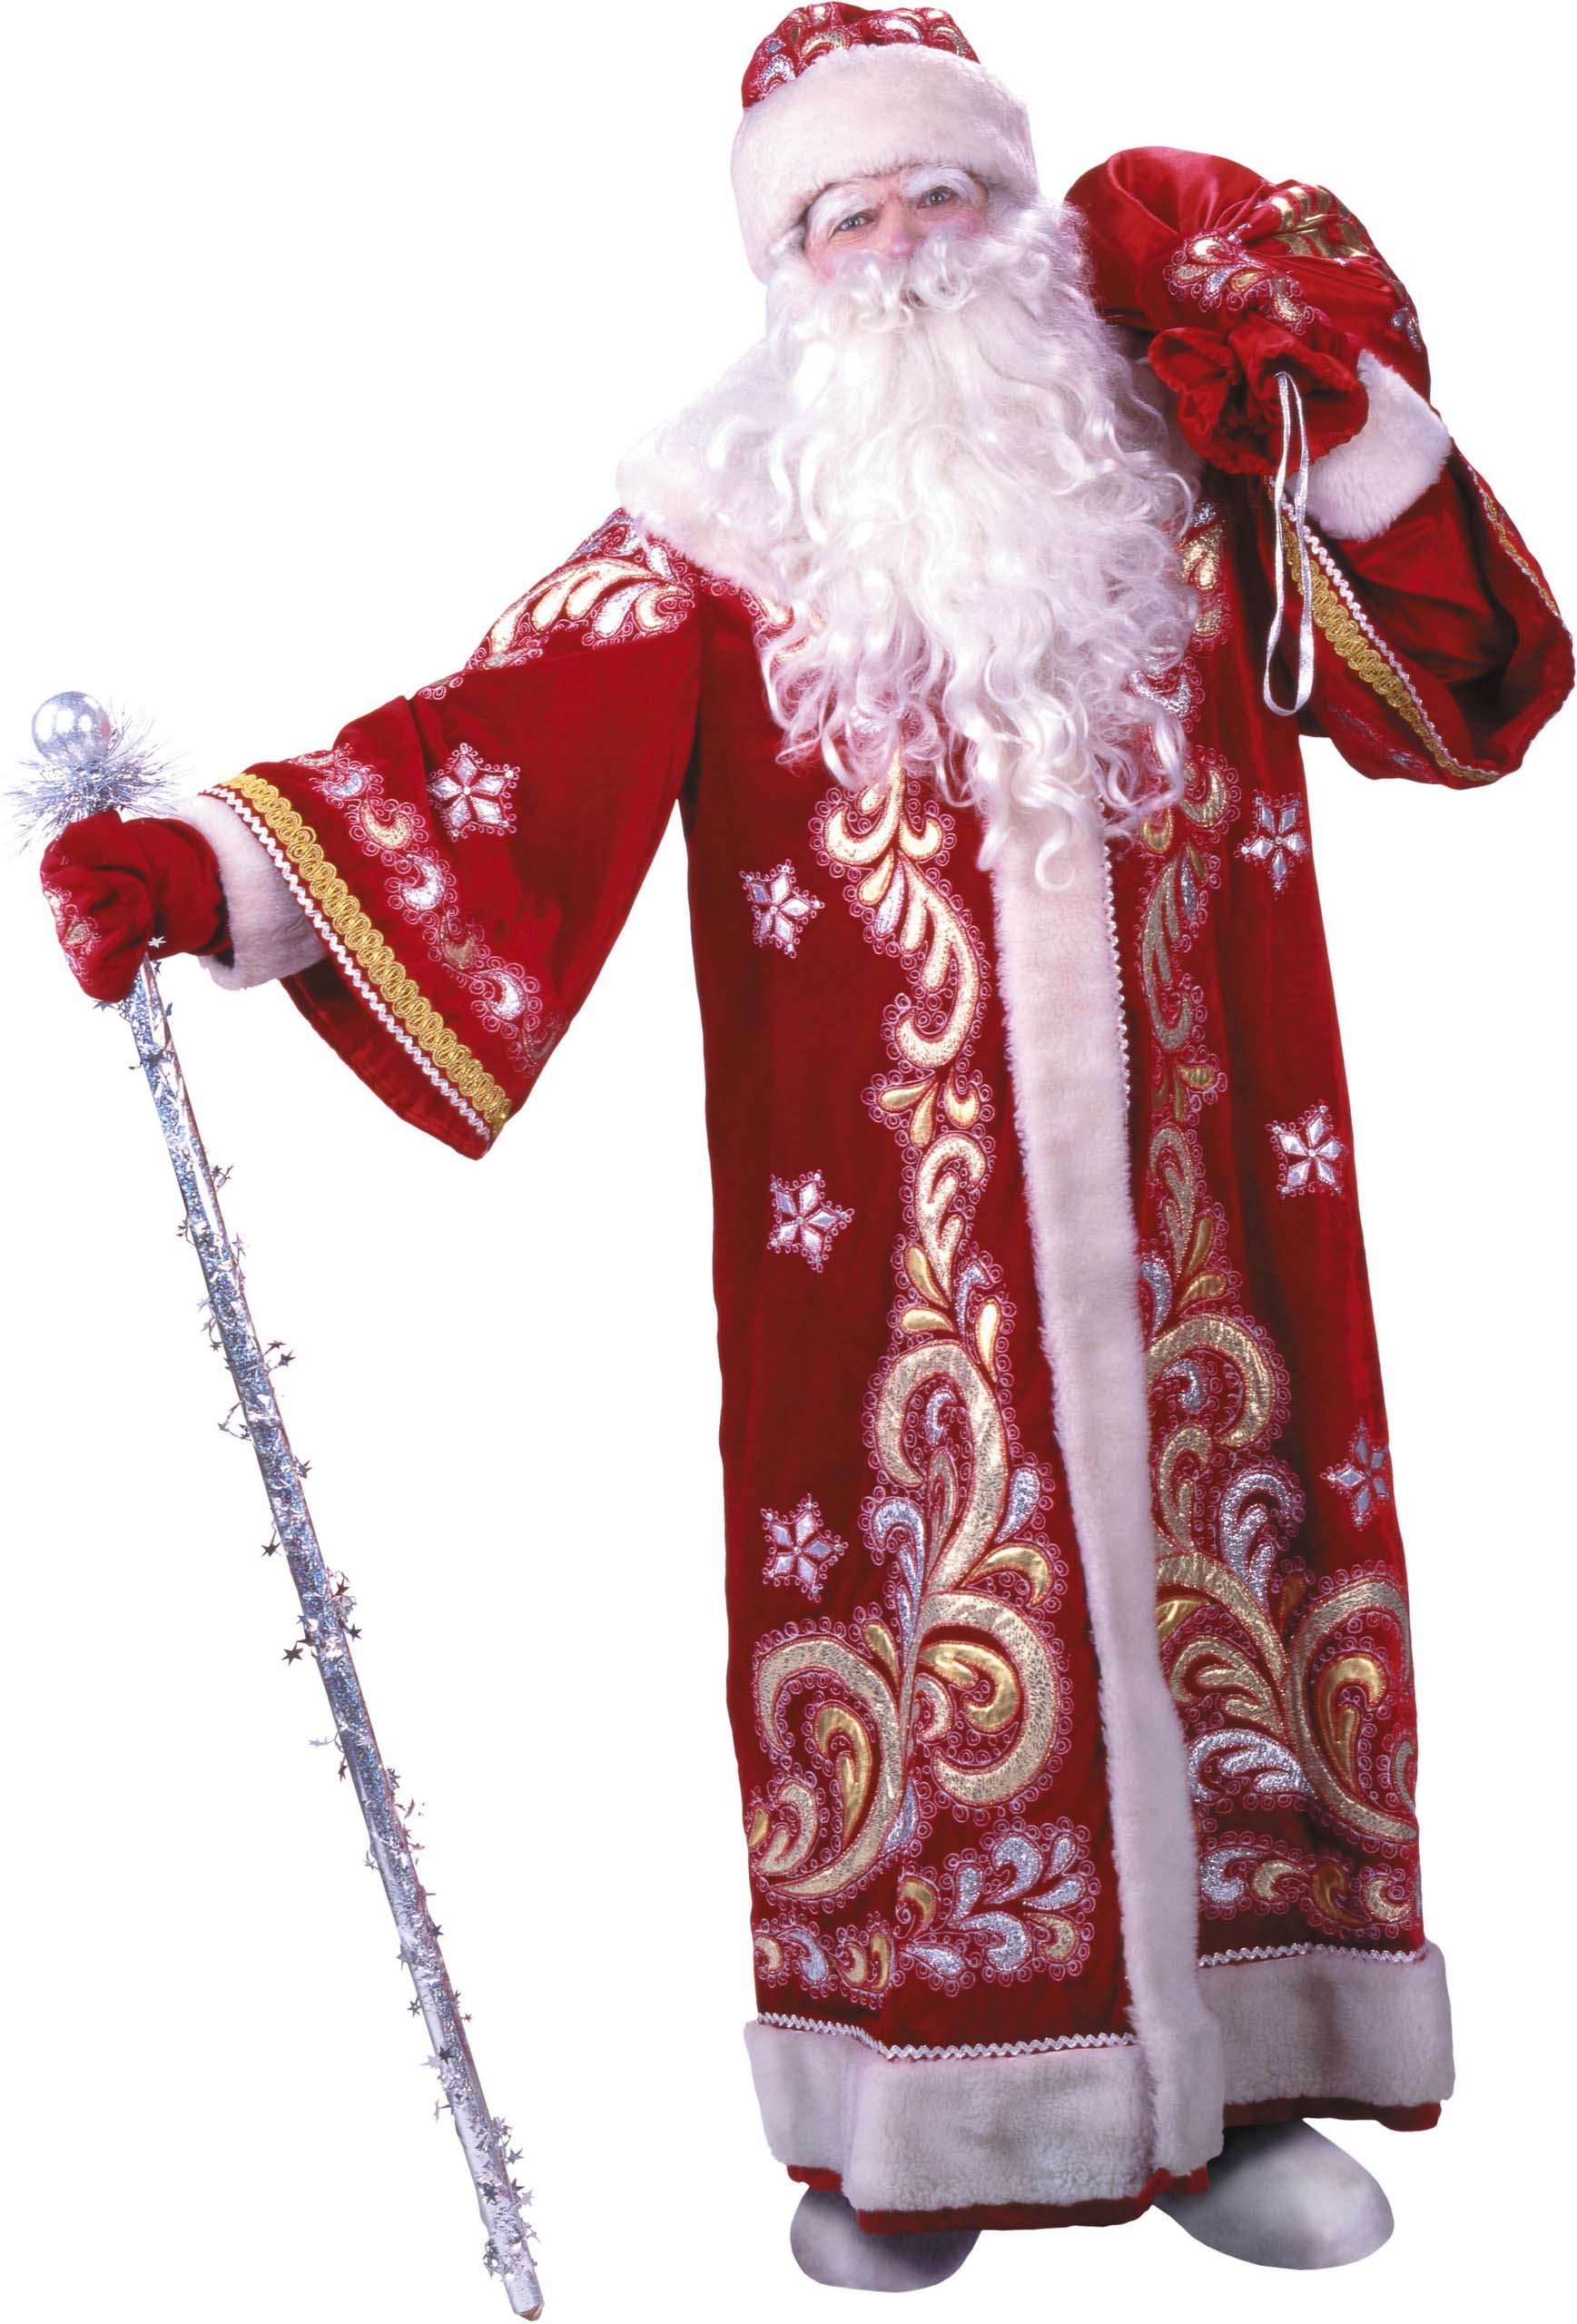 Grandfather Frost, Santa Claus and Snow Maiden 2 Дед Мороз, Санта Клаус, Снегурочка и новогодние...